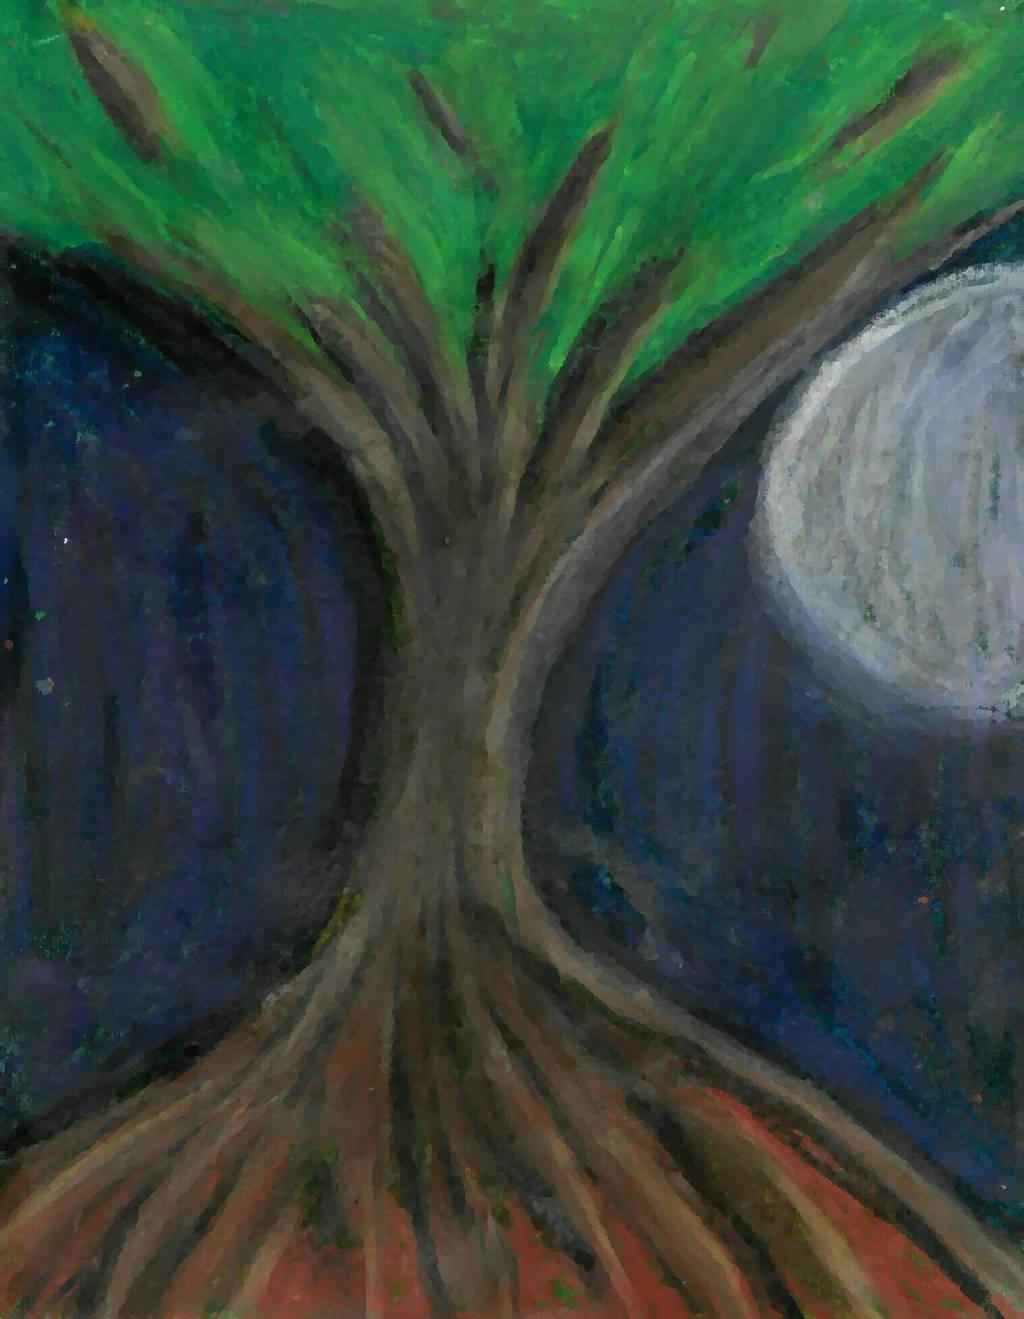 Tree of Life, bigger moon by phoenixreal